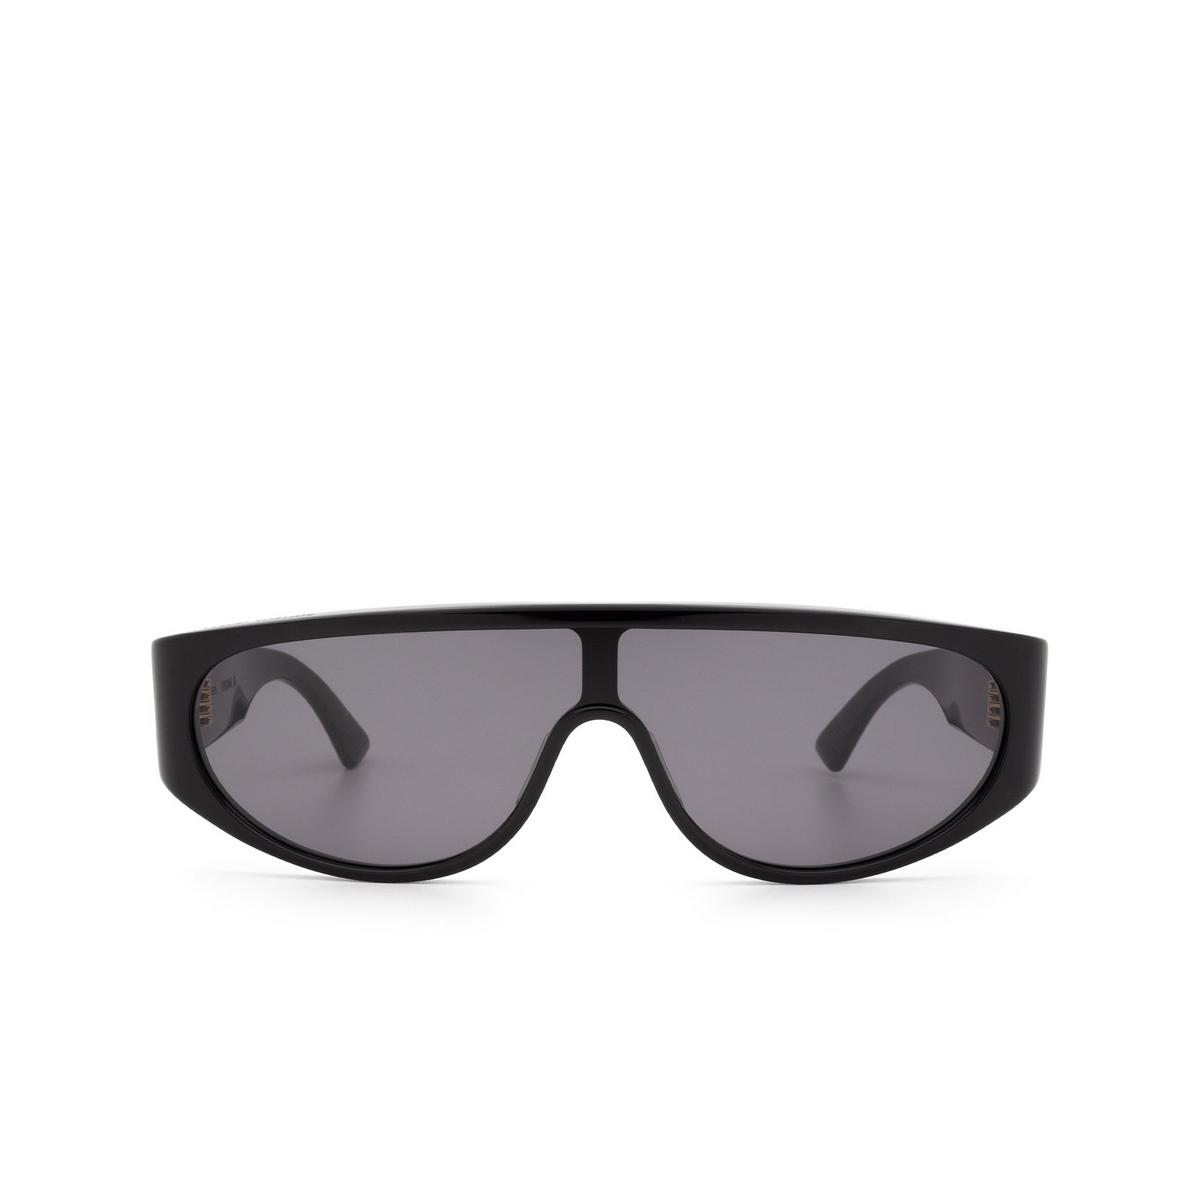 Bottega Veneta® Mask Sunglasses: BV1027S color Black 001.